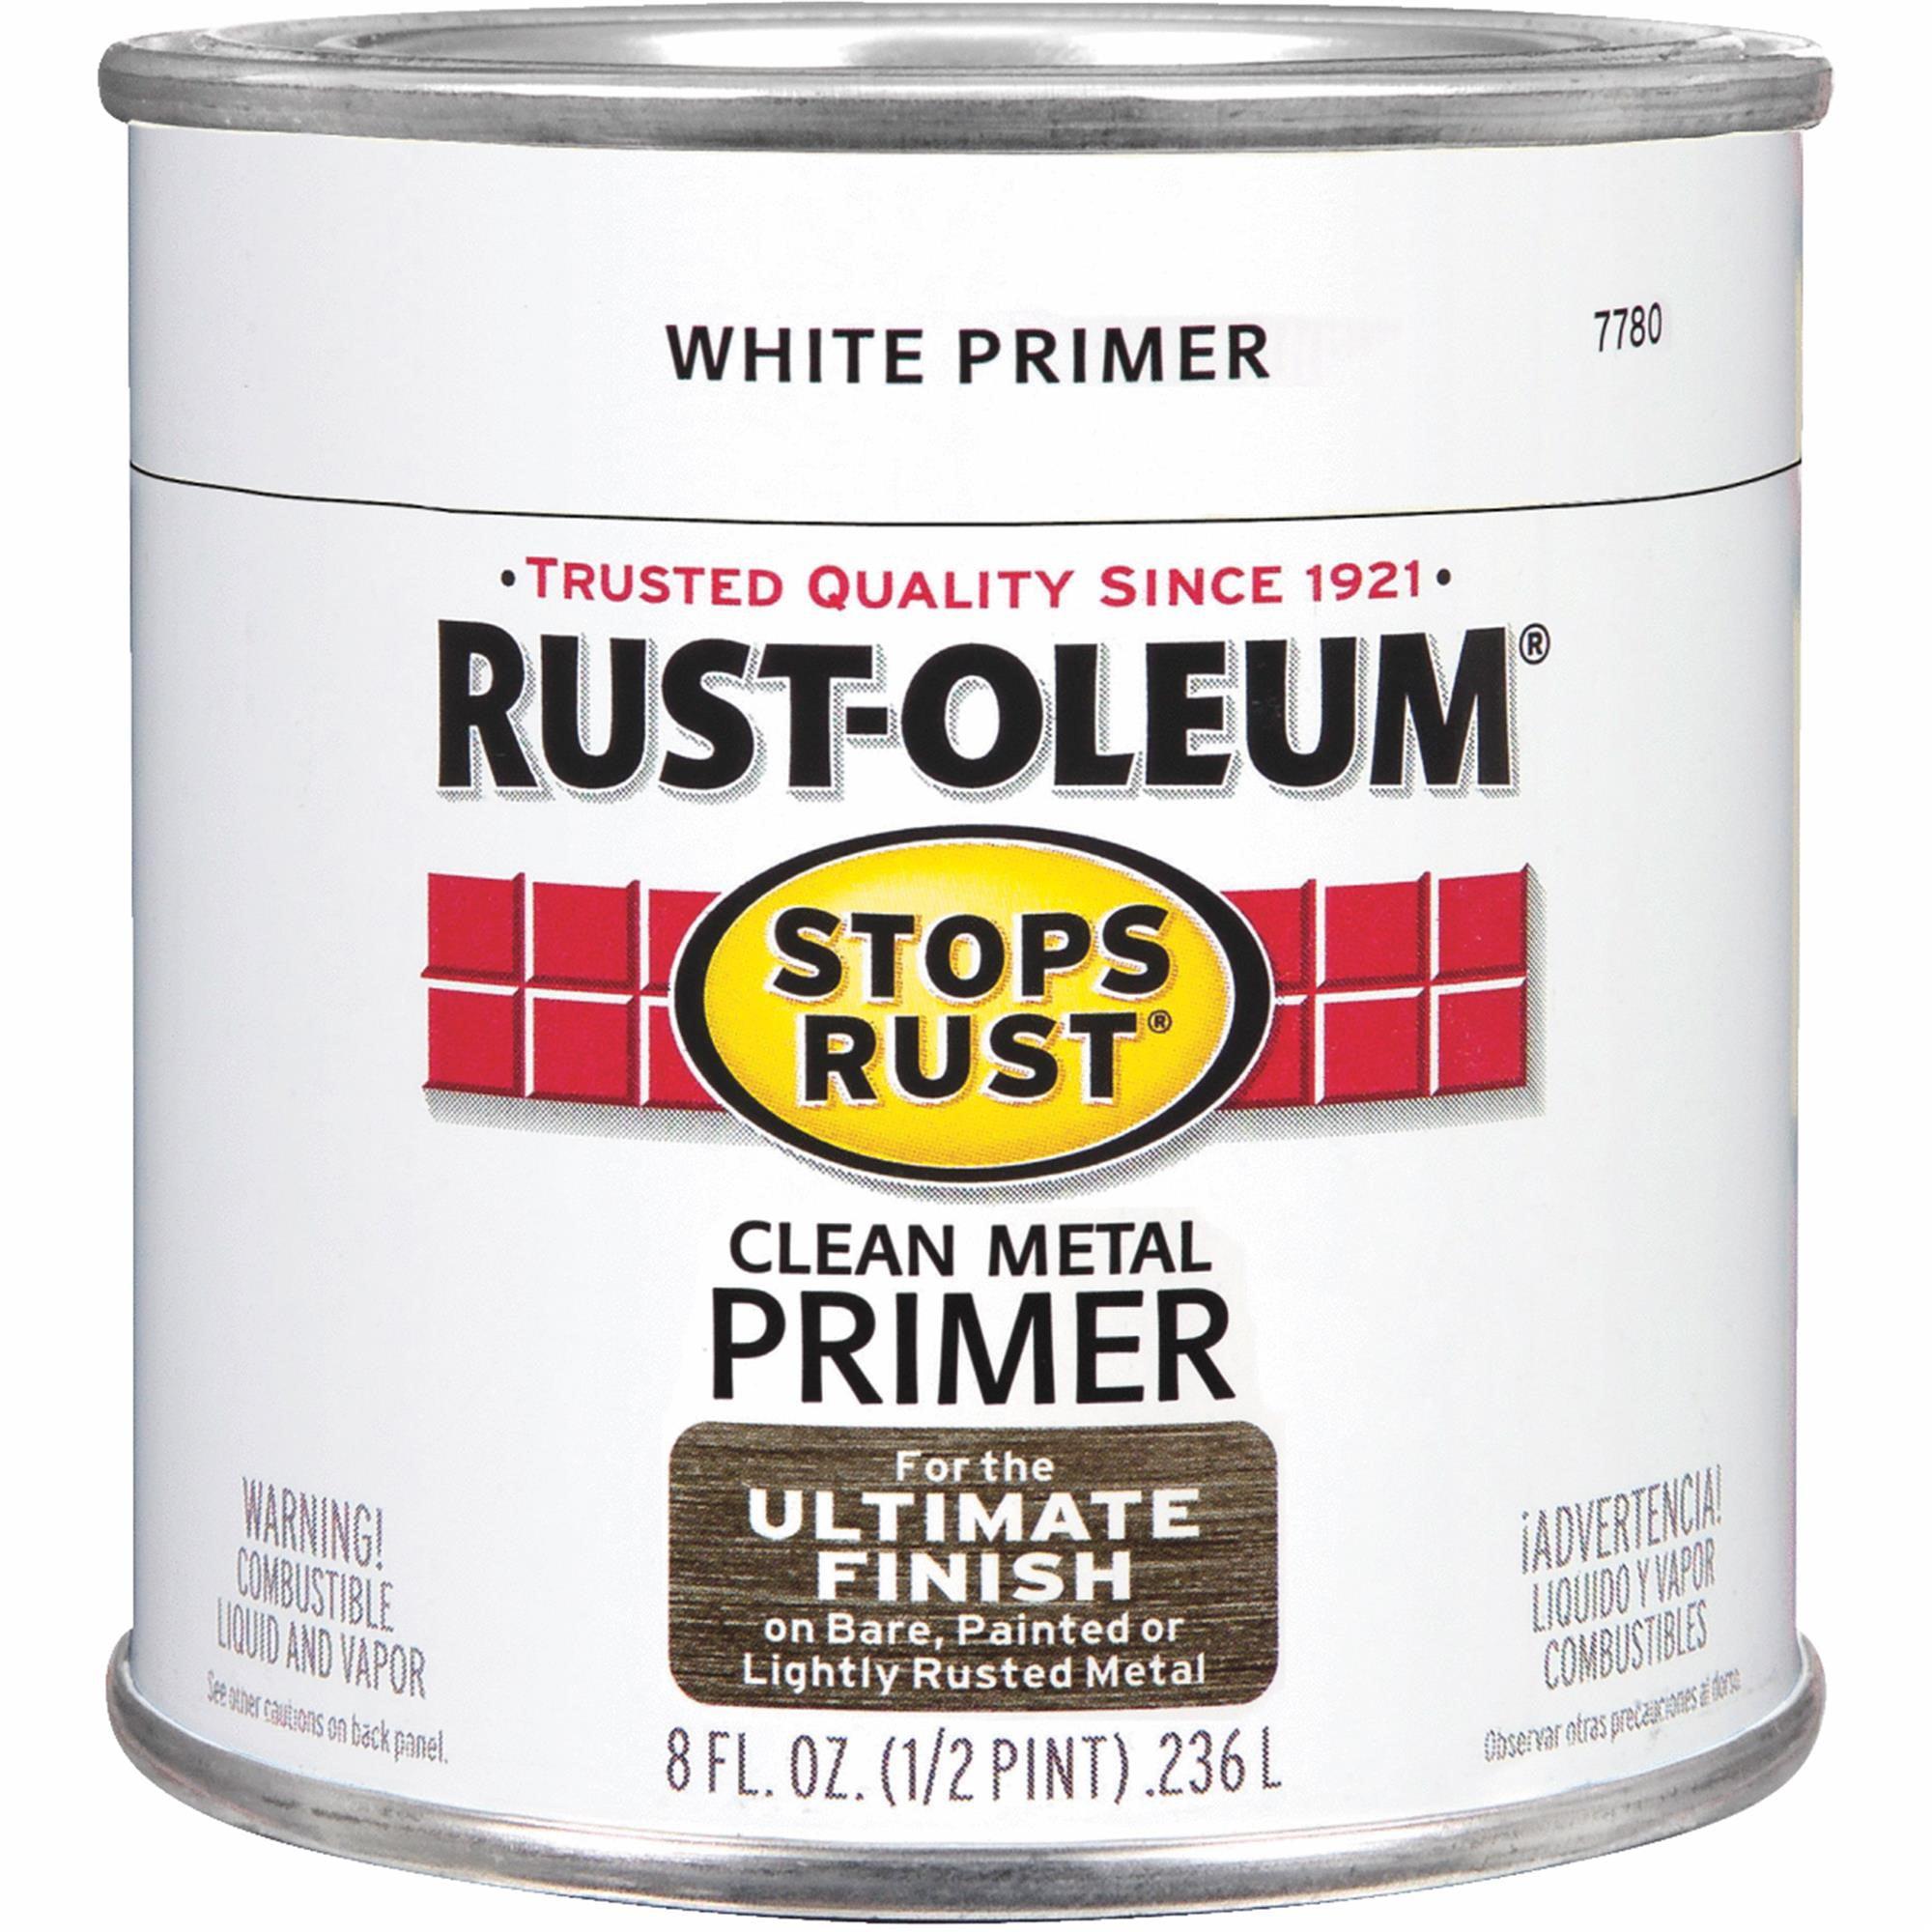 Rust-Oleum Stops Rust Clean Metal Primer